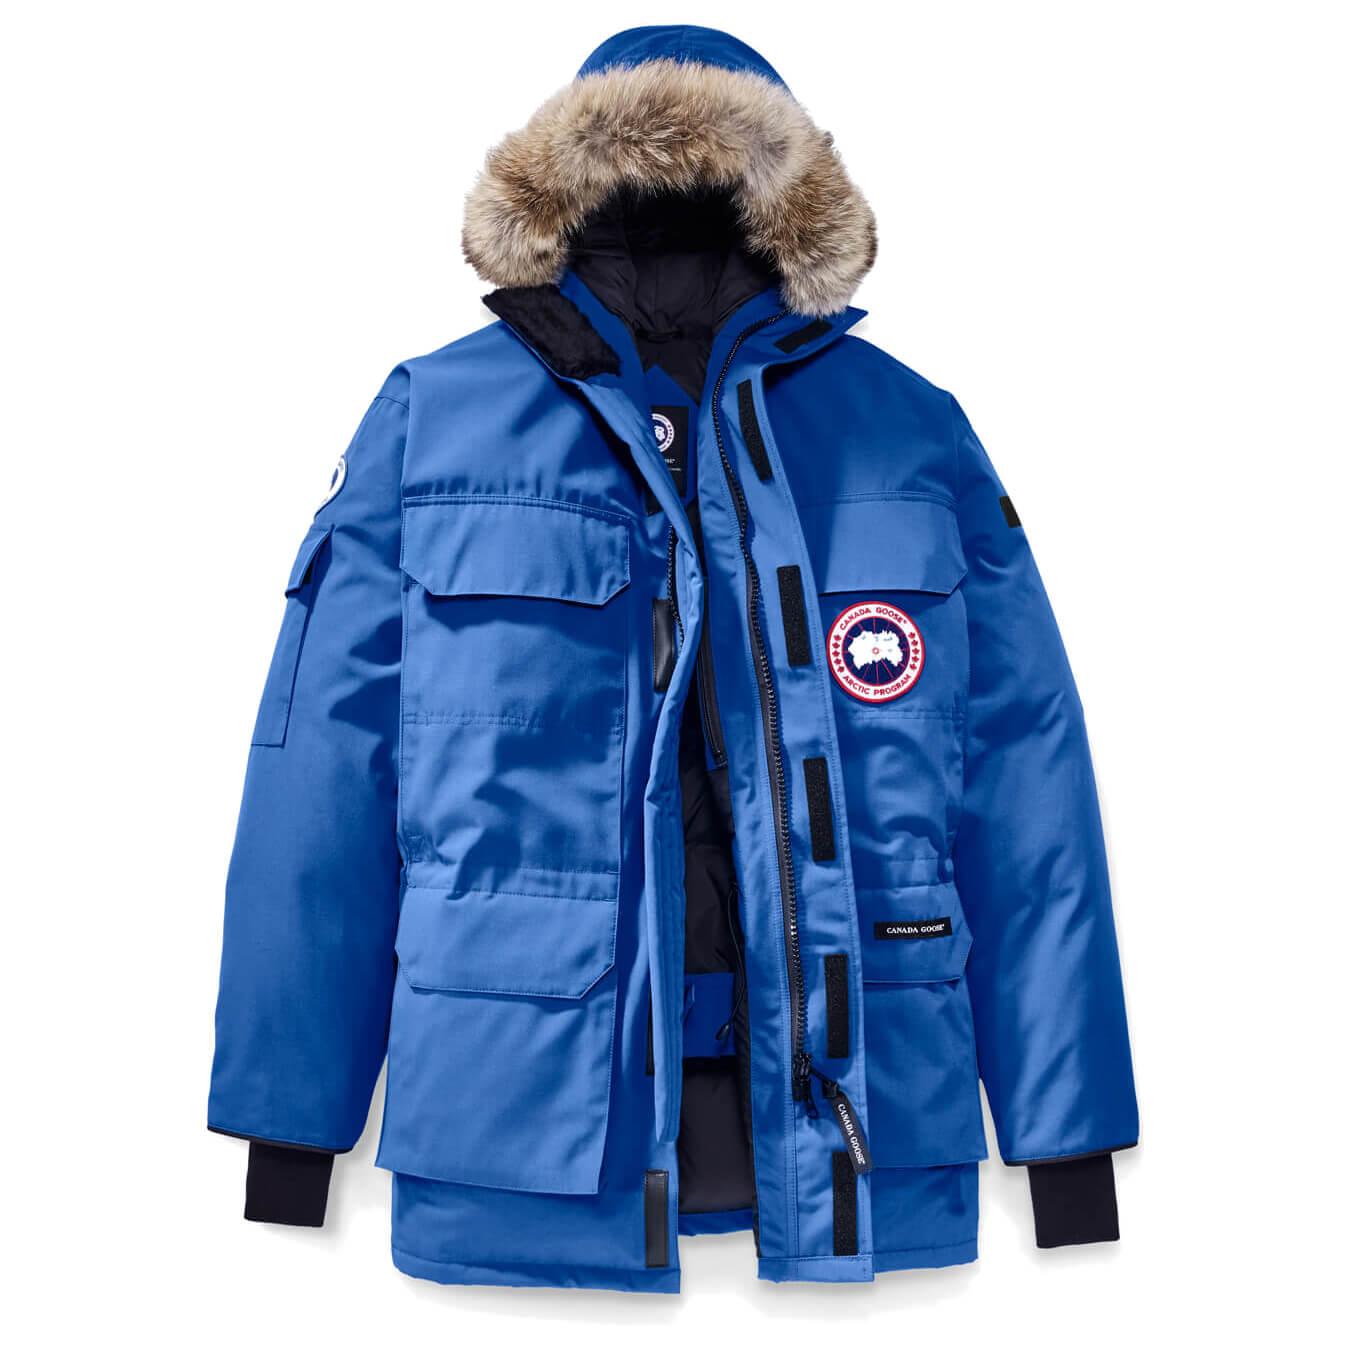 online retailer c70e7 9b6f8 Canada Goose - PBI Expedition Parka - Cappotto - Royal PBI Blue | XS